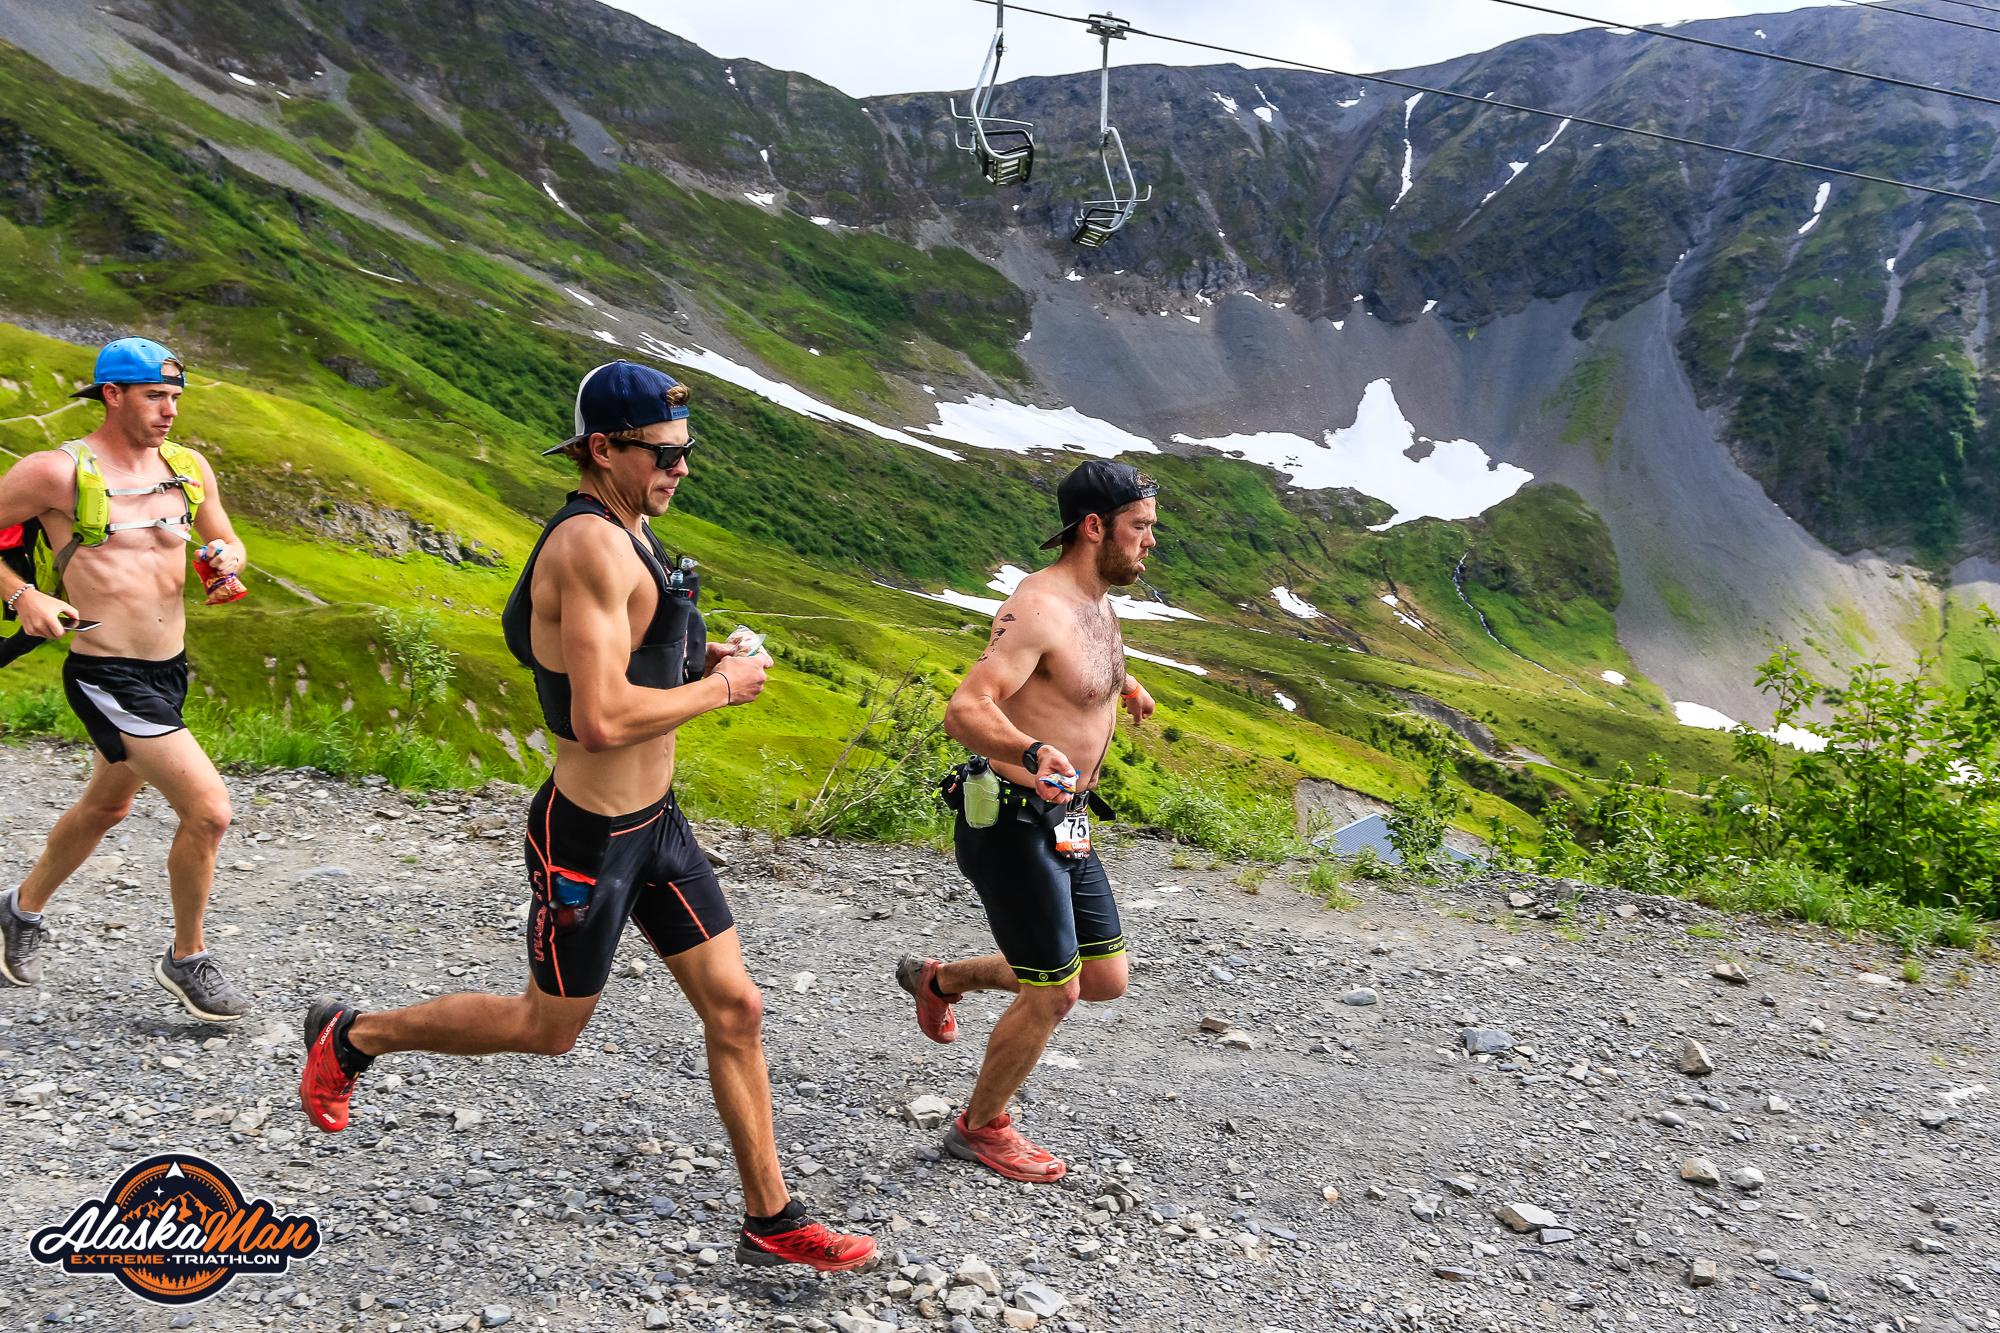 run 27.5-MILES - 44-KILOMETERS